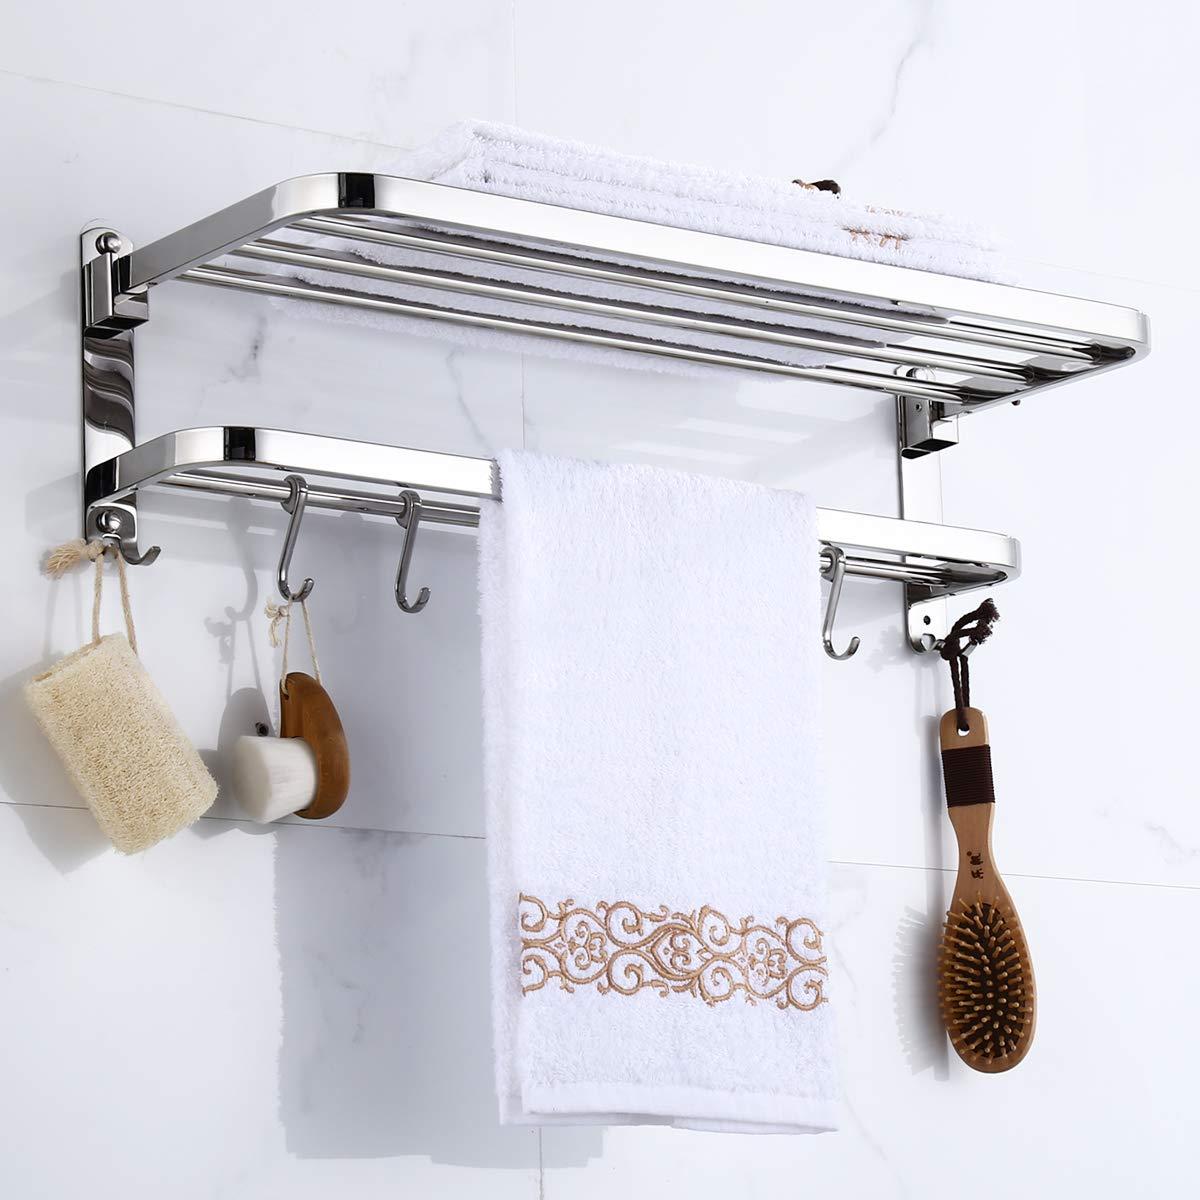 BOCCA Bathroom Towel Rack, 304 Stainless Steel Double Layers Foldable Rail Wall Mounted Towel Shelf Bar with Hooks